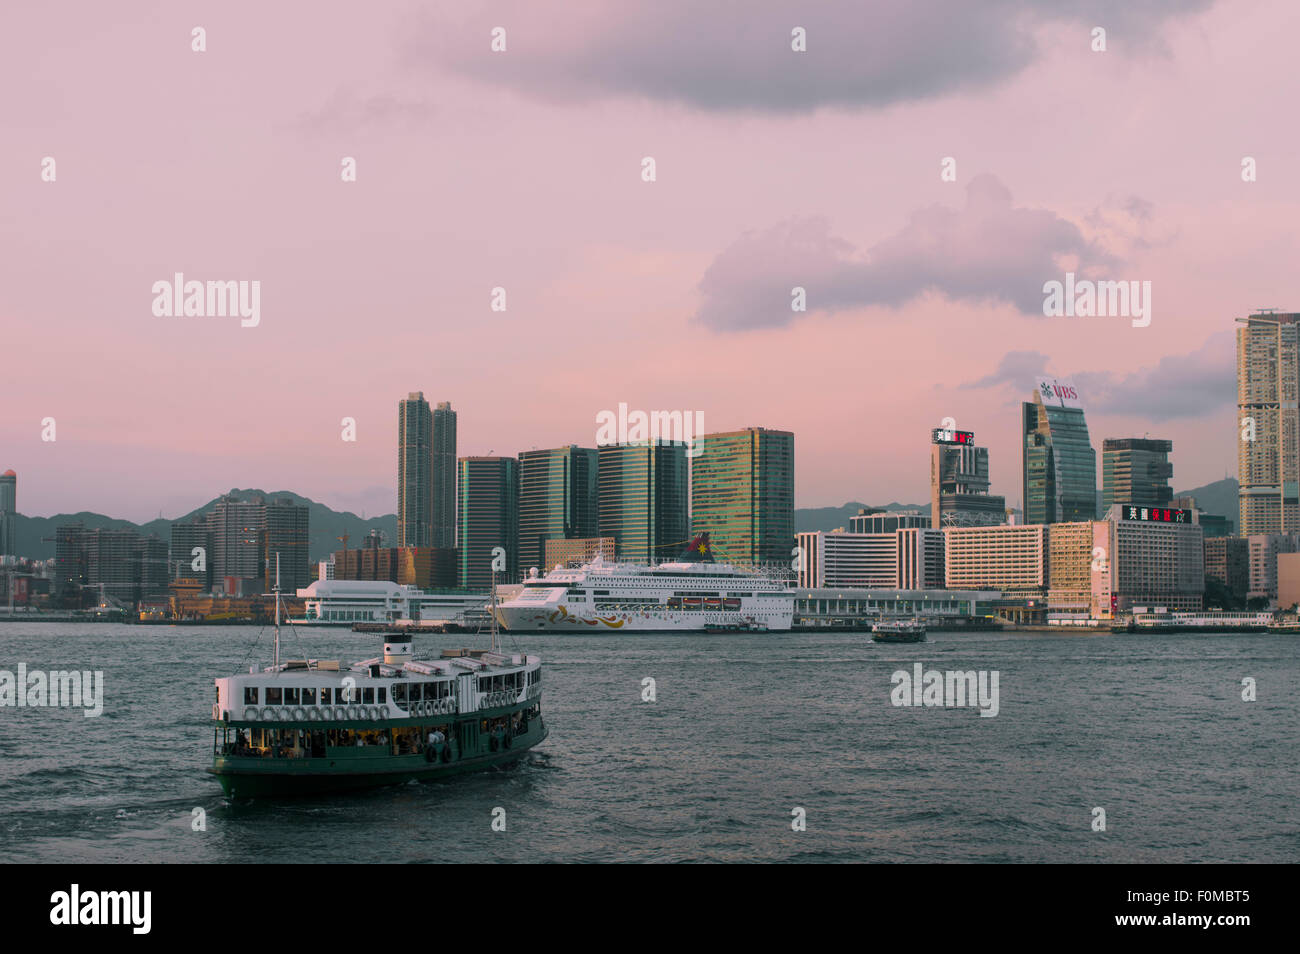 Star Ferry Central to Tsim Sha Tsui, Hong Kong. - Stock Image